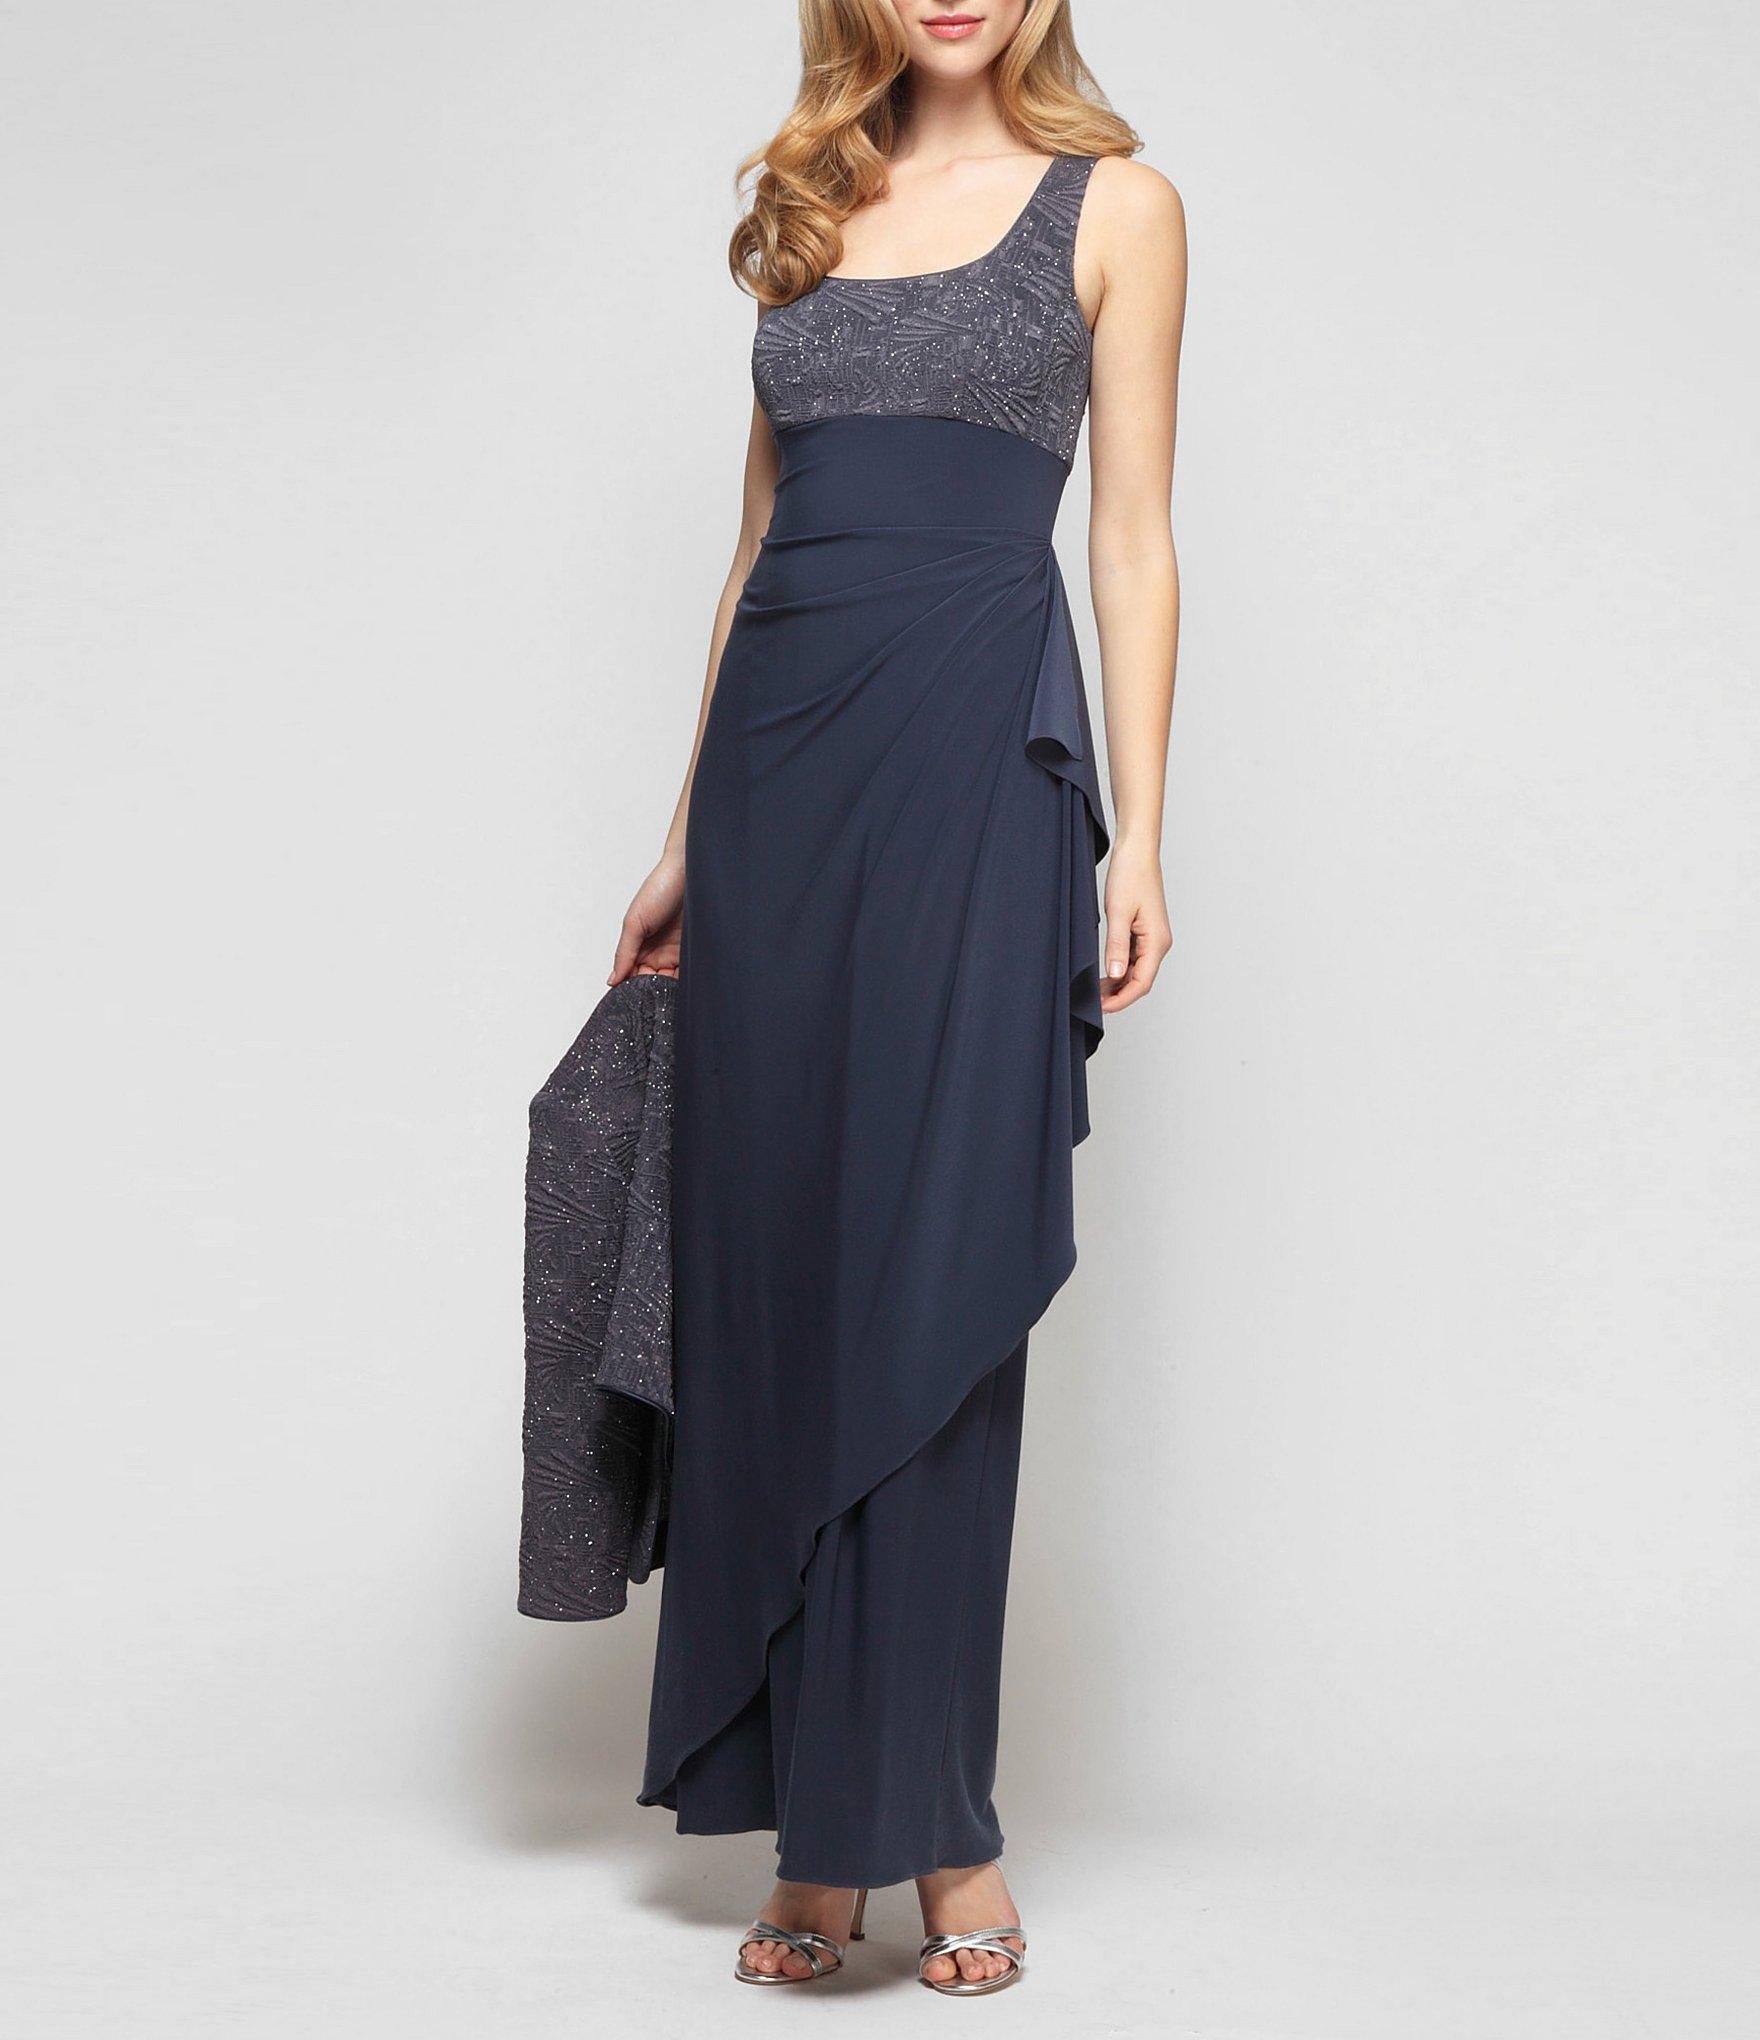 bad75a9cee45e Alex Evenings - Blue Ruched 2-piece Glitter Jacket Dress - Lyst. View  fullscreen